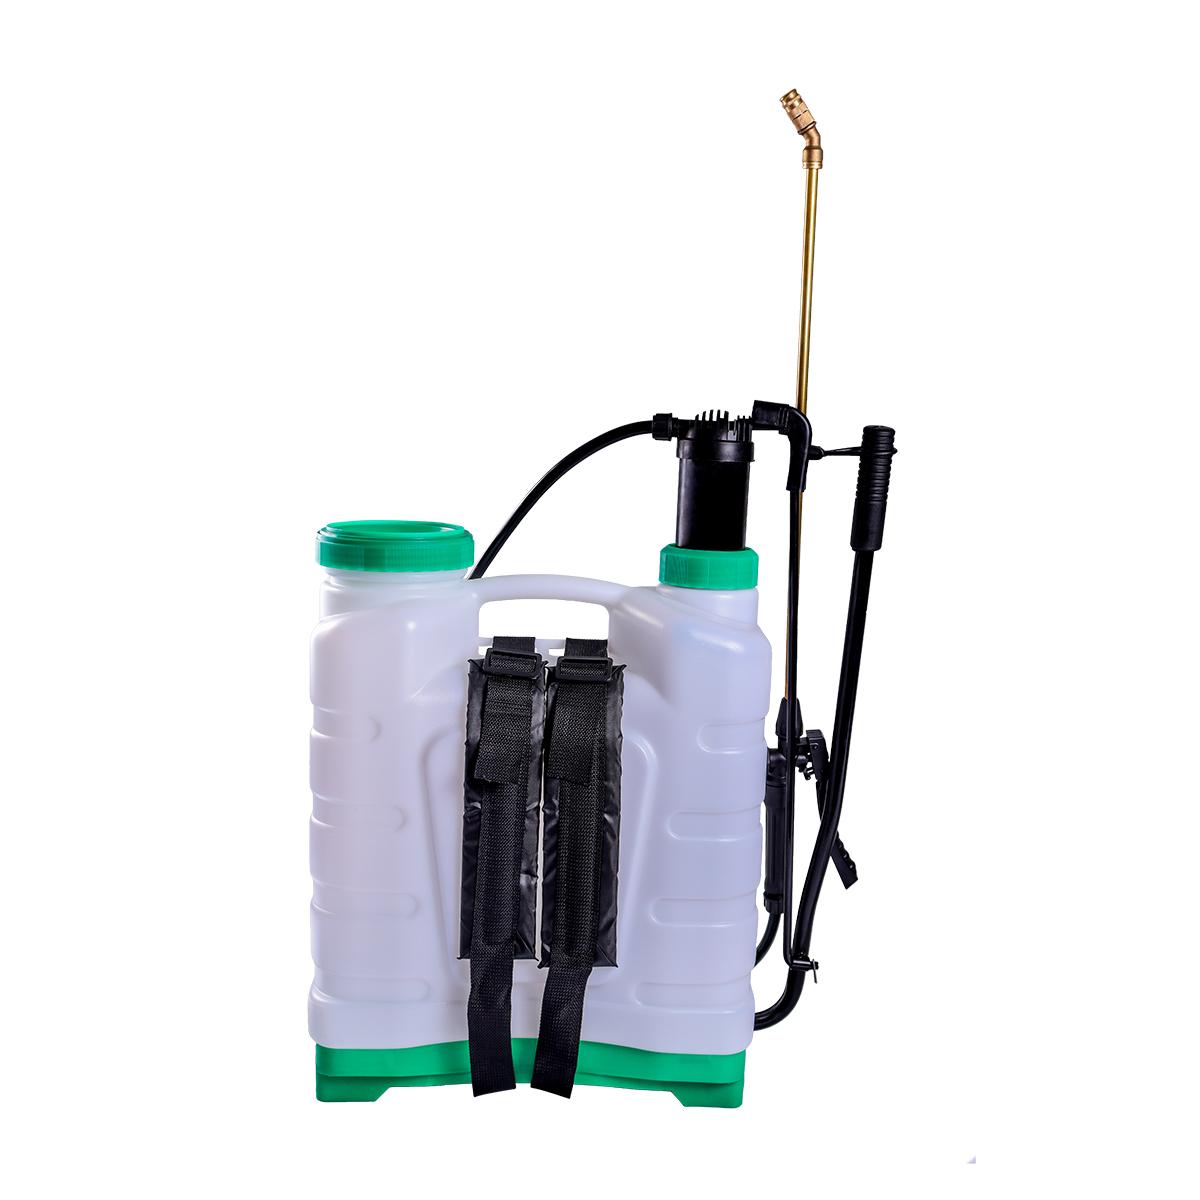 Pulverizador Costal Manual 20 Litros SuperAgri  +  Coador + Lança De Metal + Alavanca + Conector + CIlindro Completo